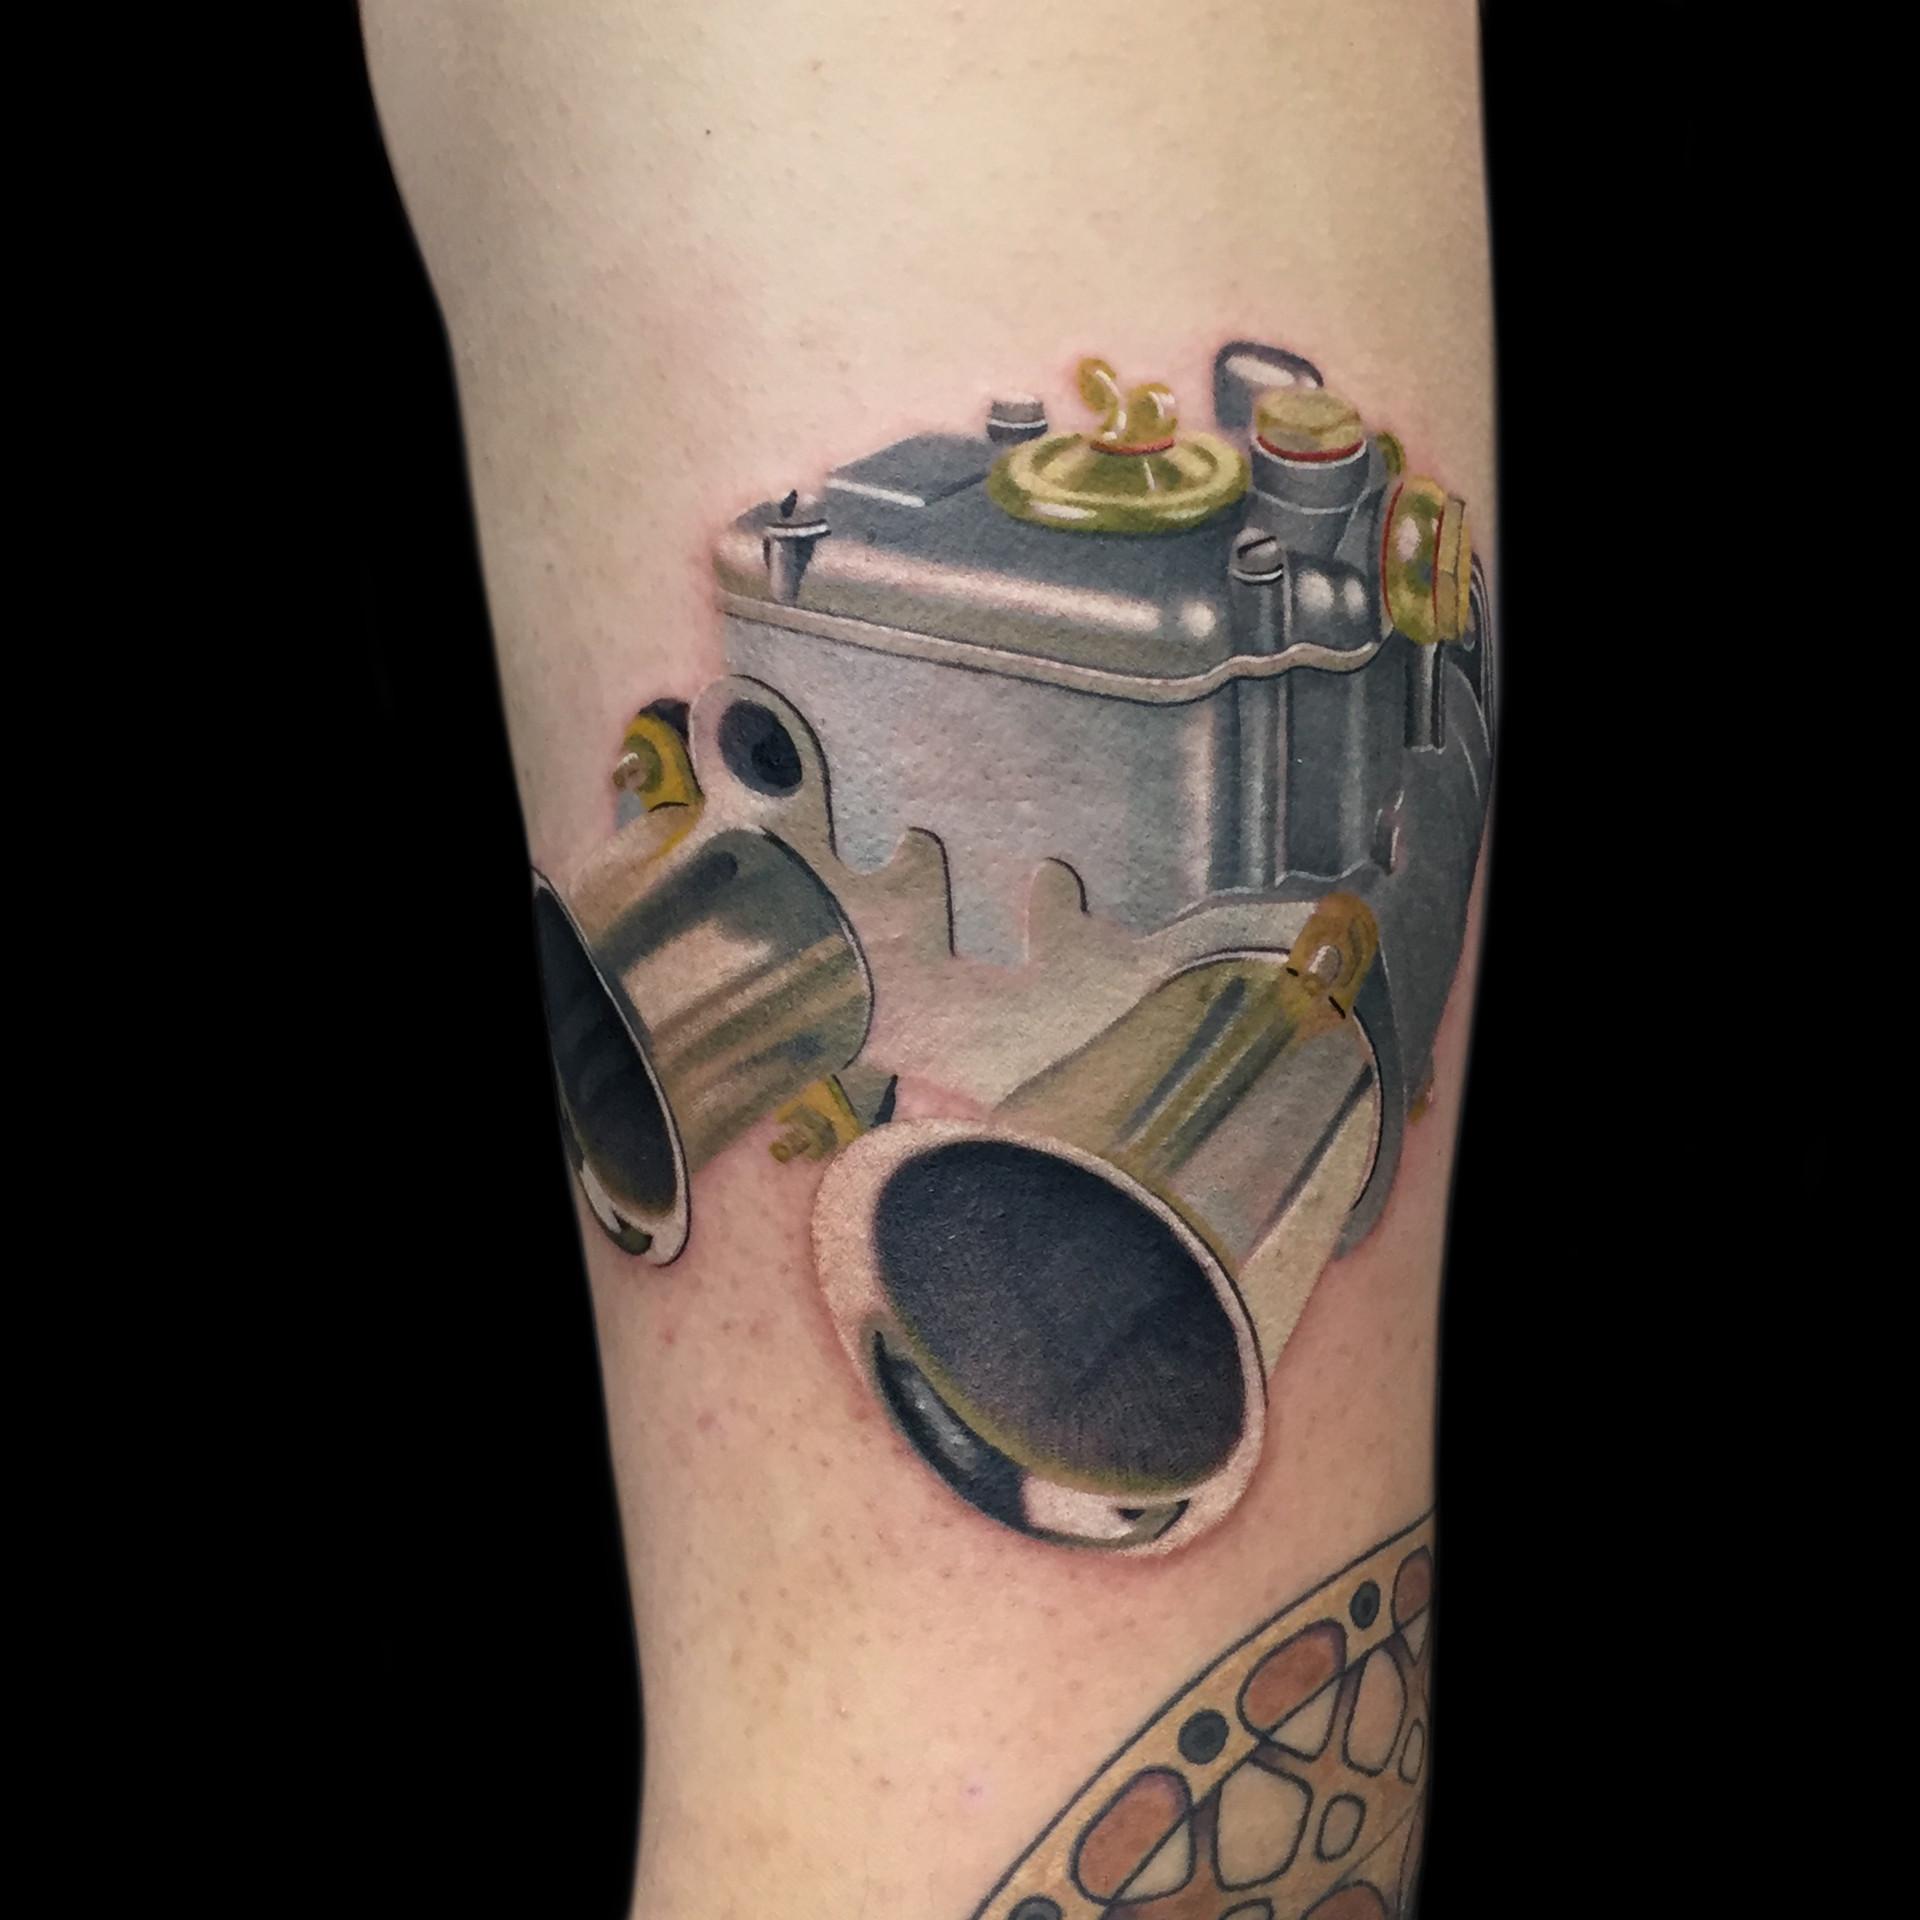 Chris_Hautundliebe_Tattoo_Vergaser.jpg